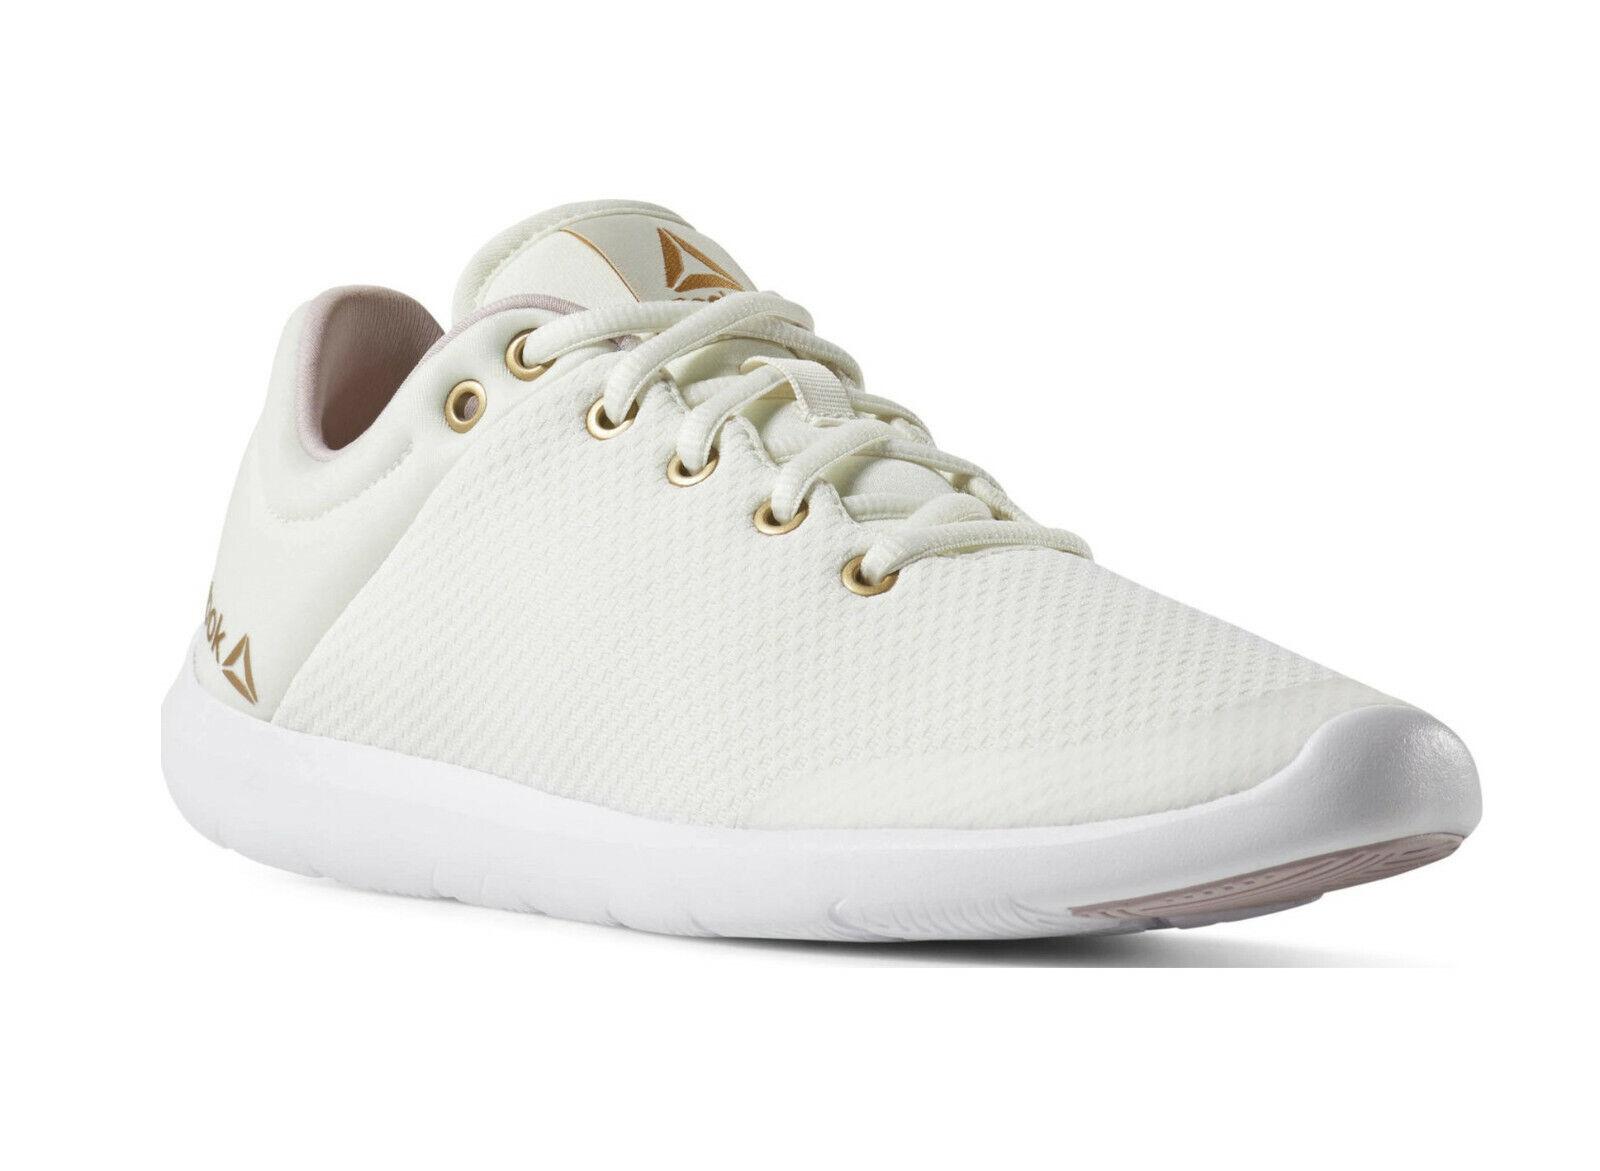 Reebok Femme Chaussures Fitness Danse Studio Basics Confort Léger Cn6670 Neuf